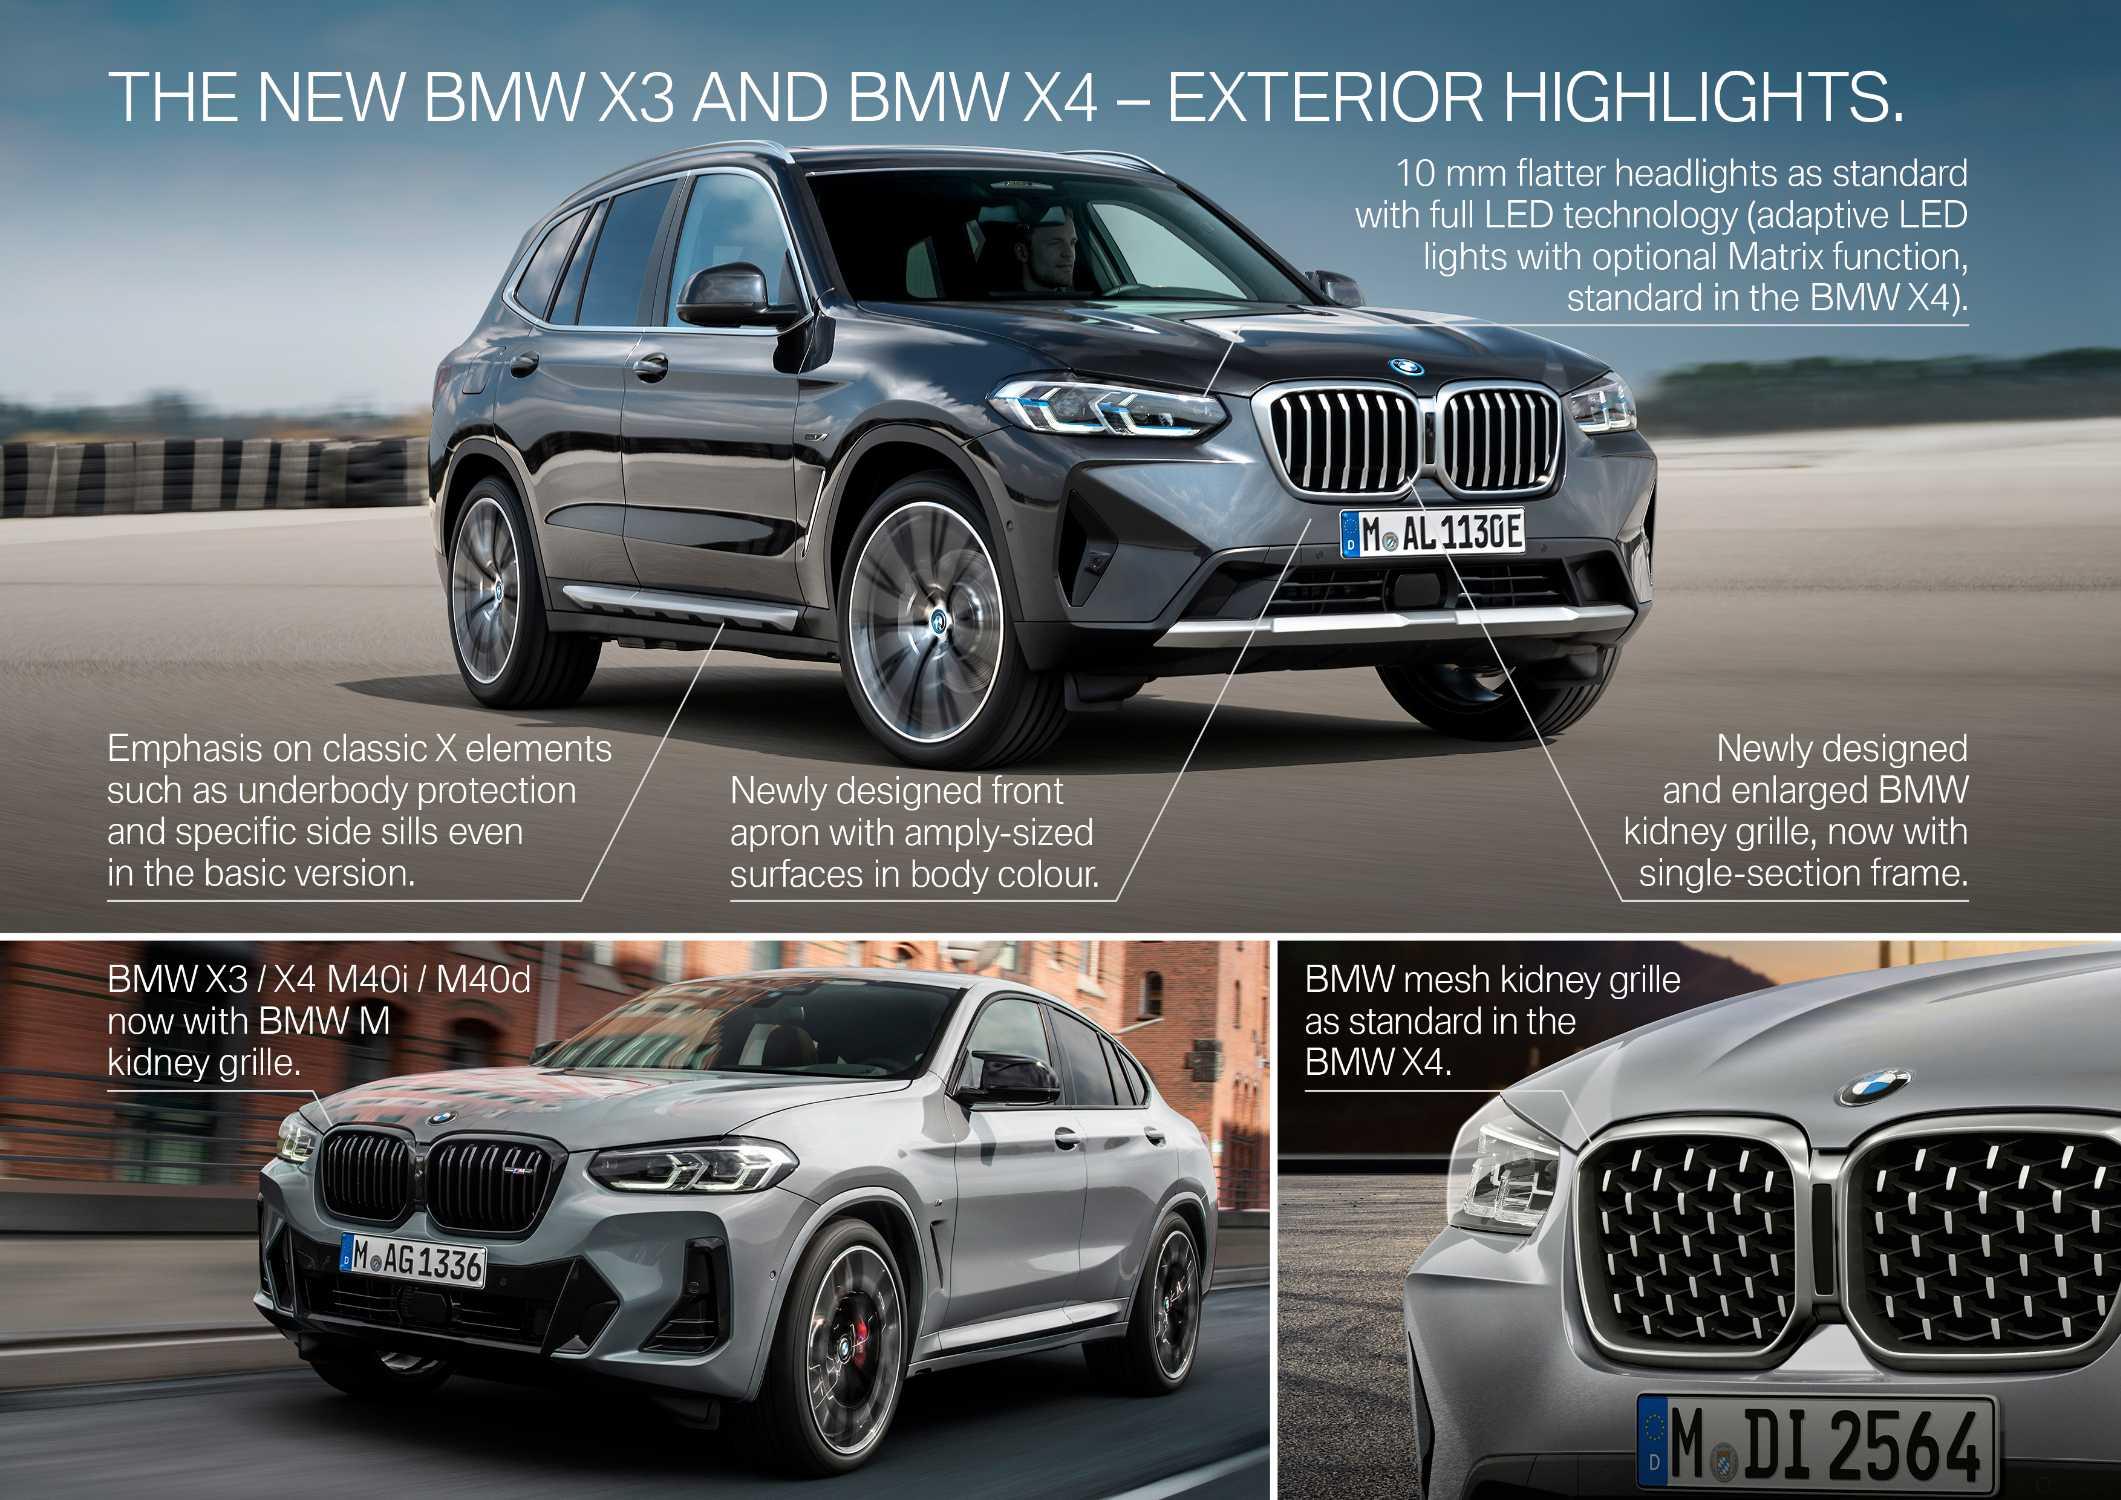 "The new BMW X3 xDrive30e, Sophisto Grey metallic, Rim 21"" Styling 726 and the new BMW X4 M40i, Brooklyn Grey metallic, Rim 21"" Styling 718M (06/2021)."